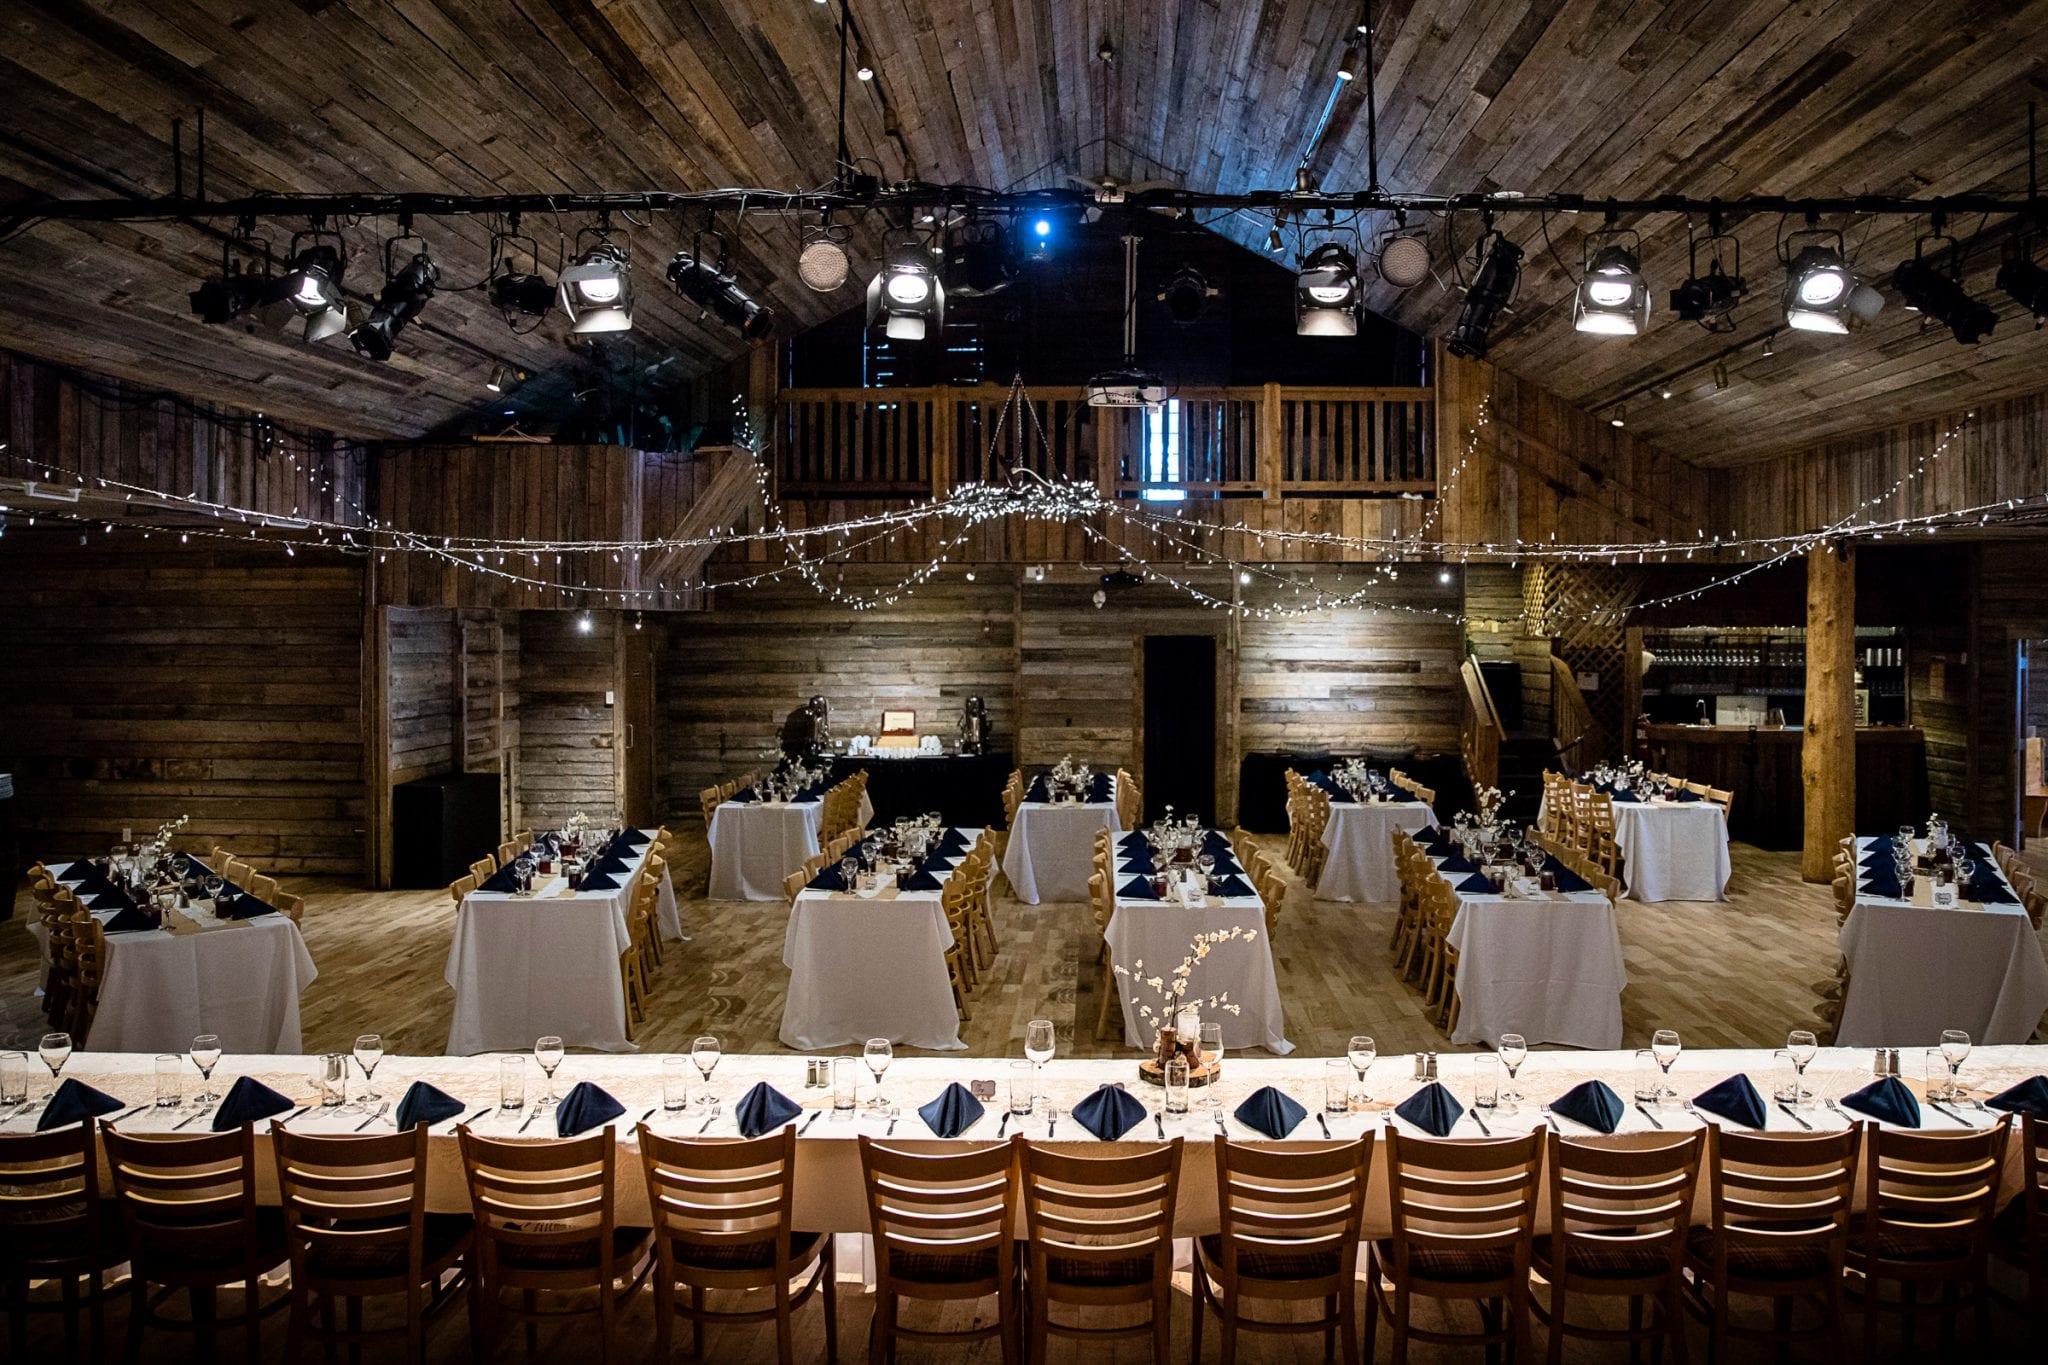 cornerstone theatre canmore, corporate event, banquet dinner